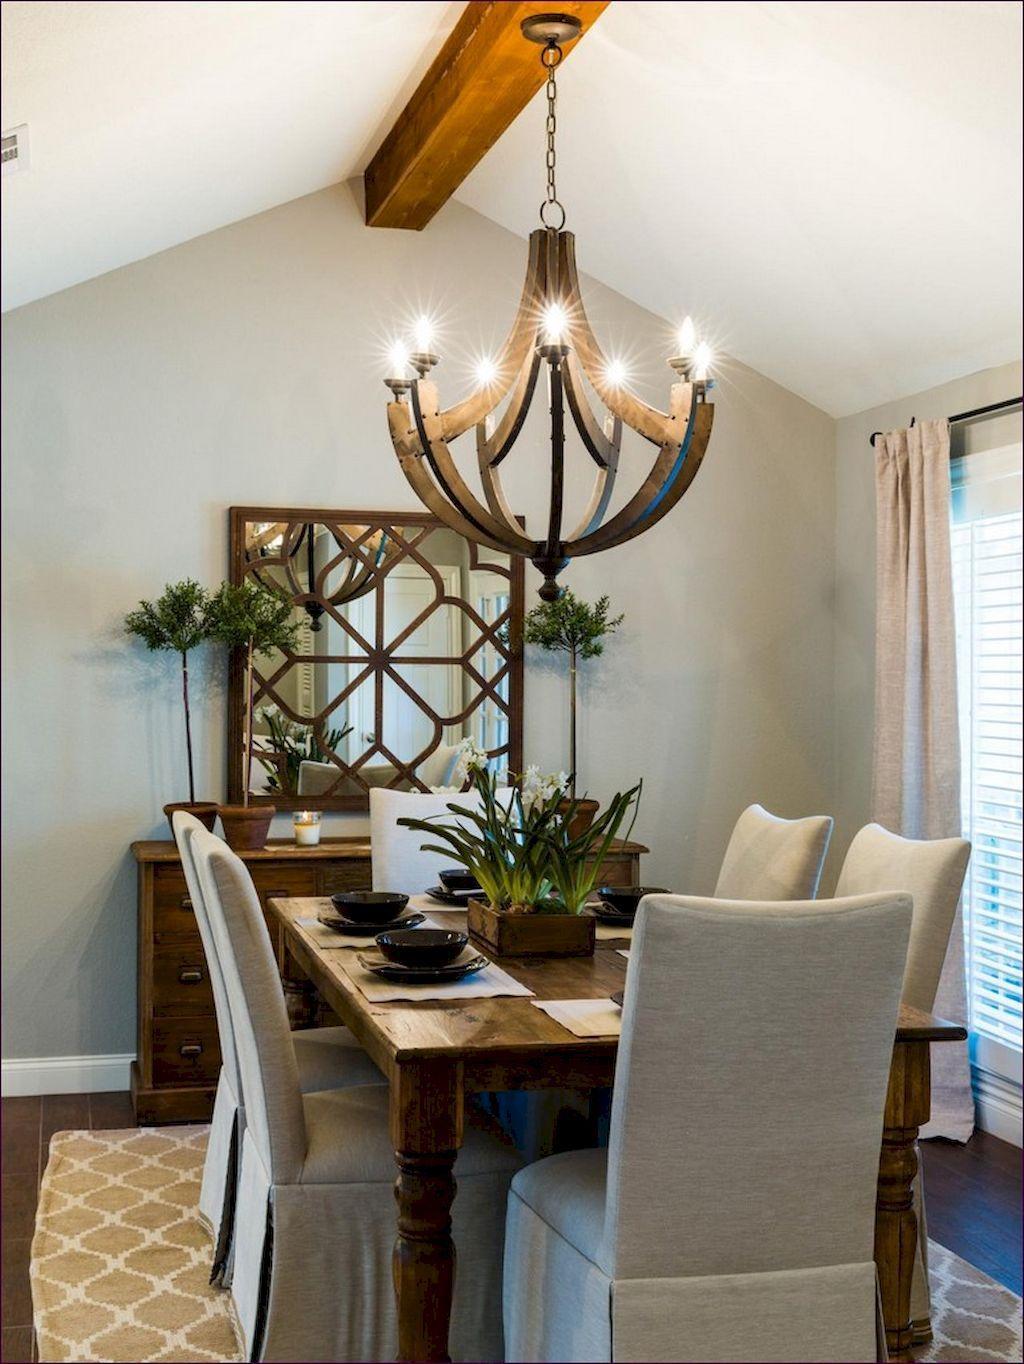 58 Awesome Modern Farmhouse Dining Room Design Ideas